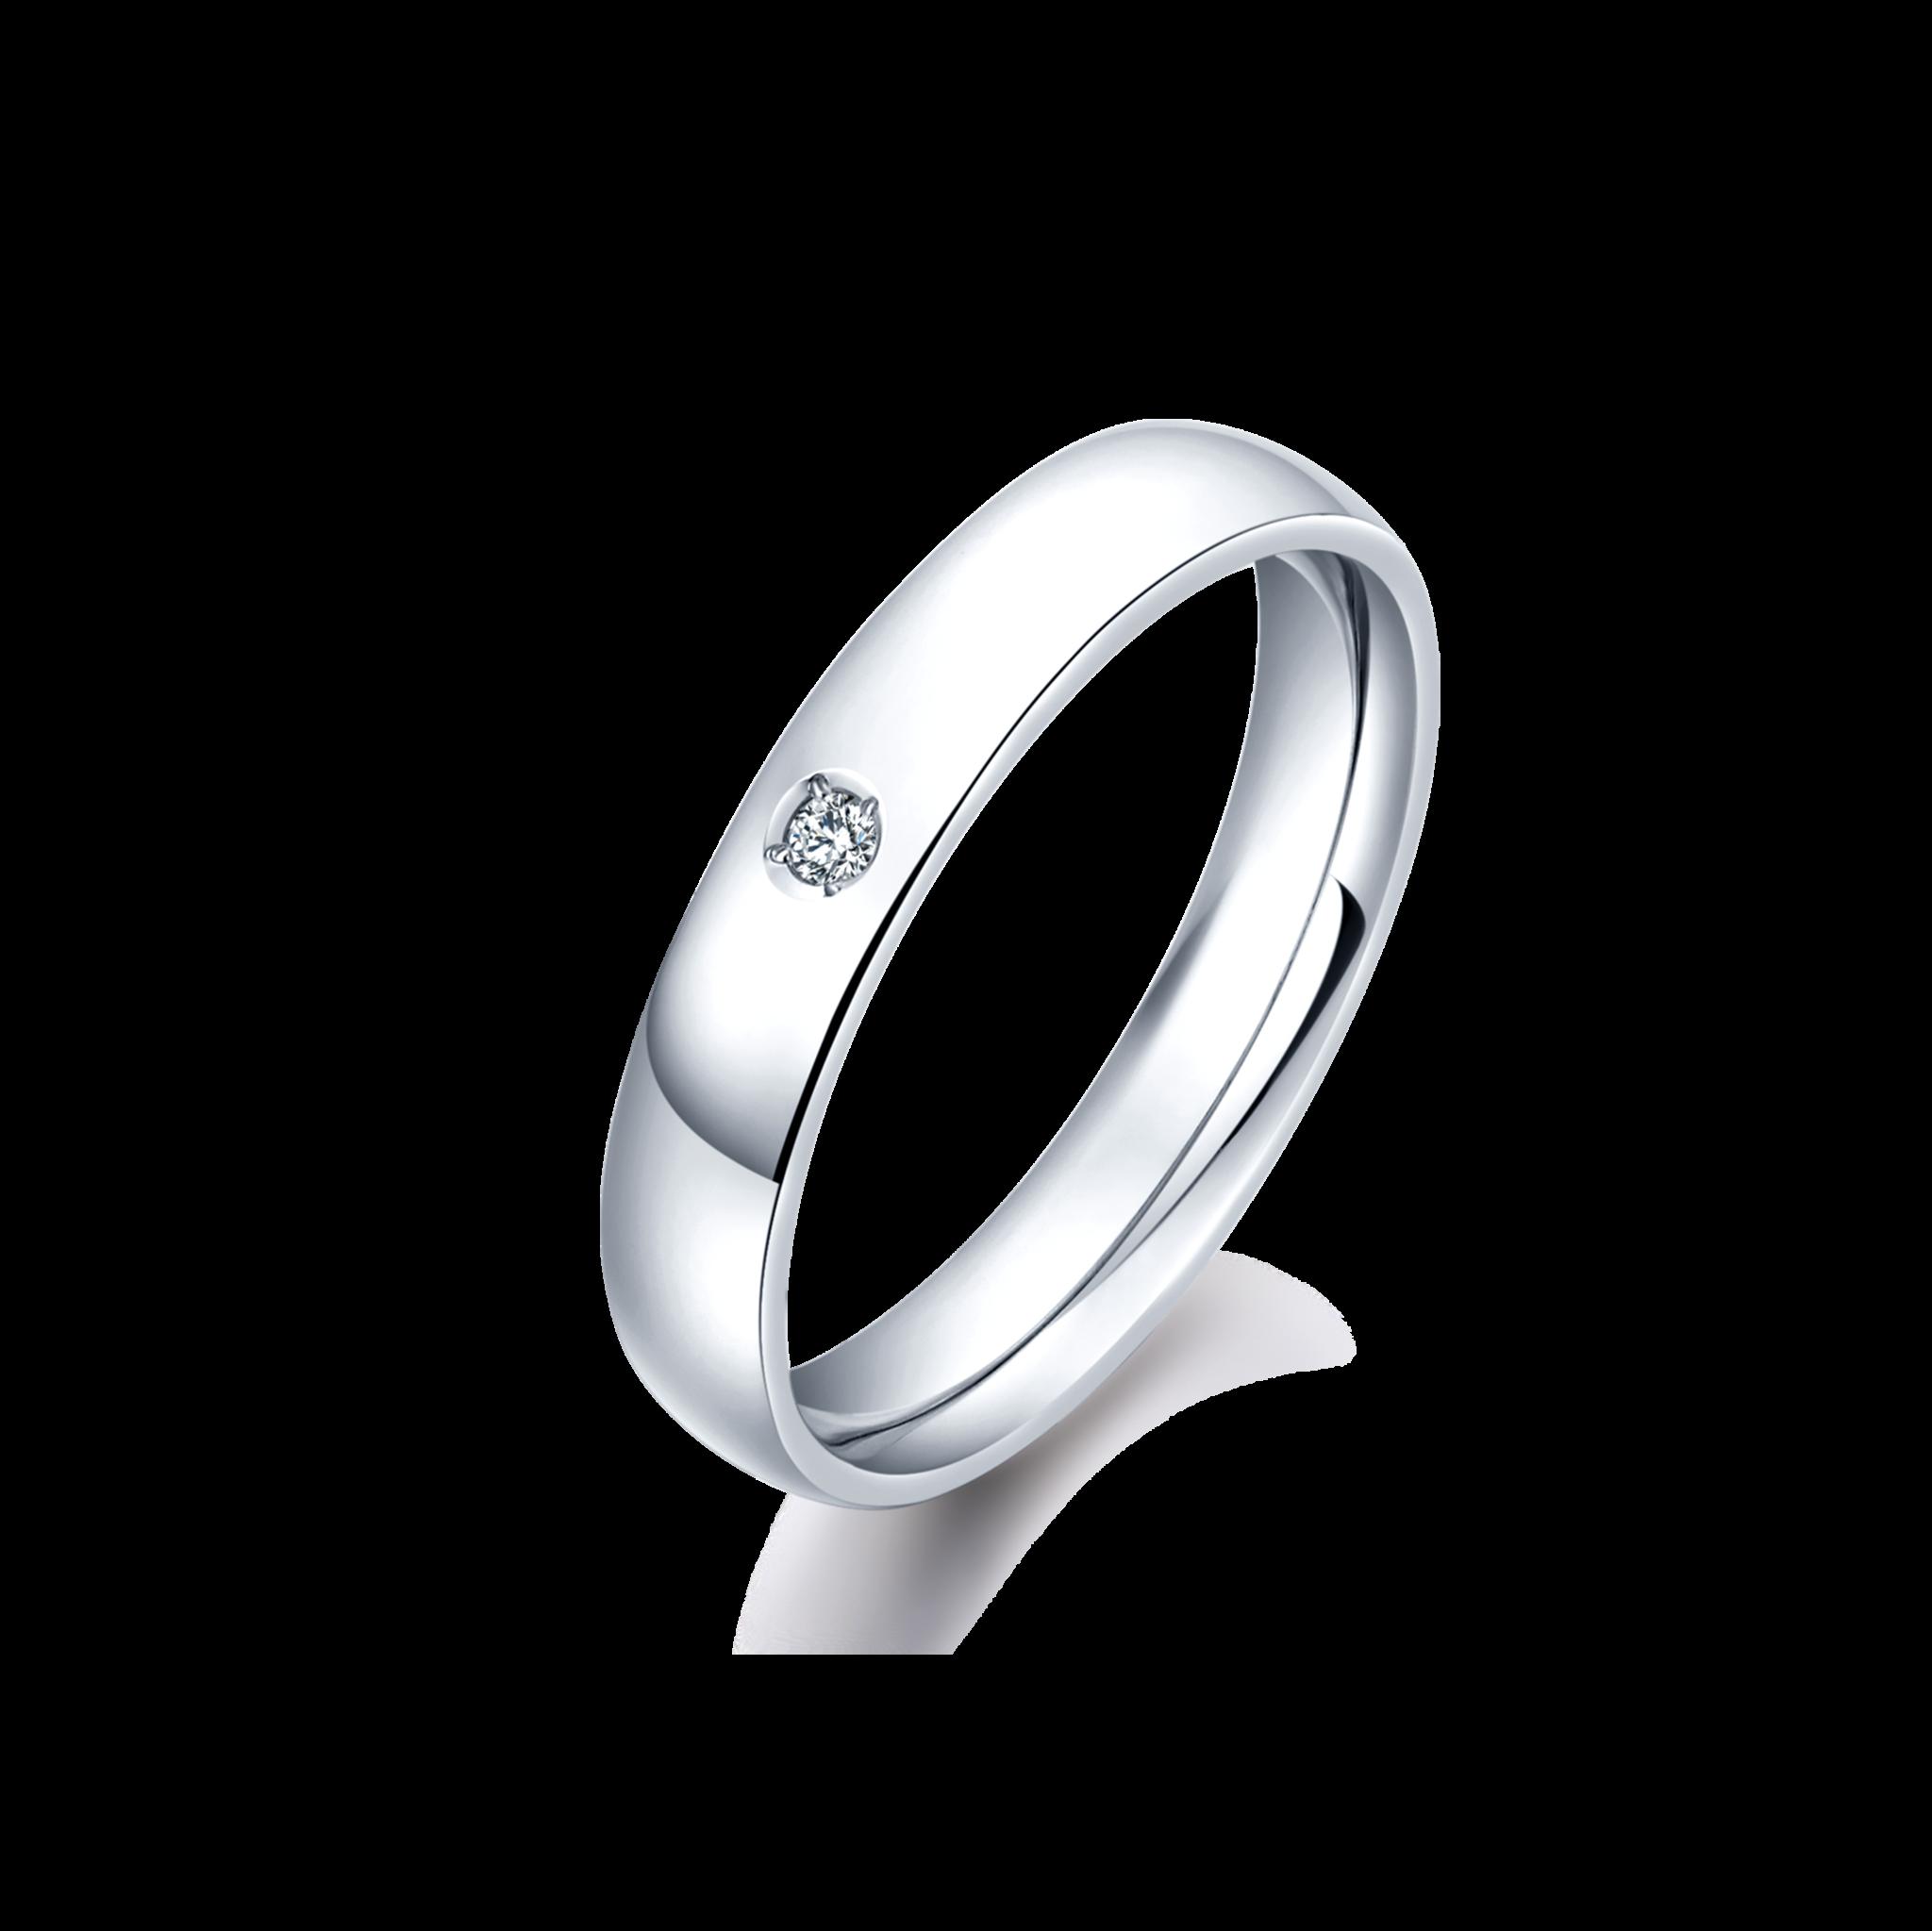 SAKURA Collection PT950 单钻 圆环对戒-女 10999